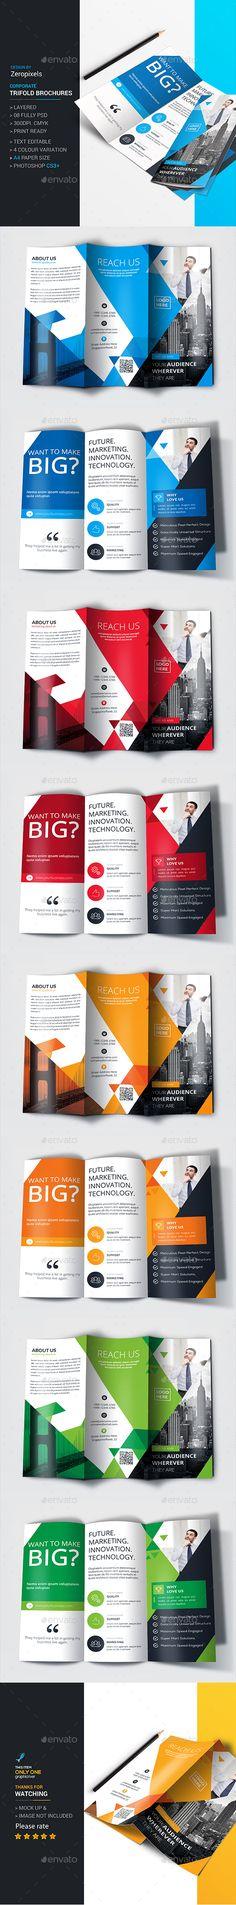 Trifold Brochure for Business Brochure \ Flyer Designs - technology brochure template